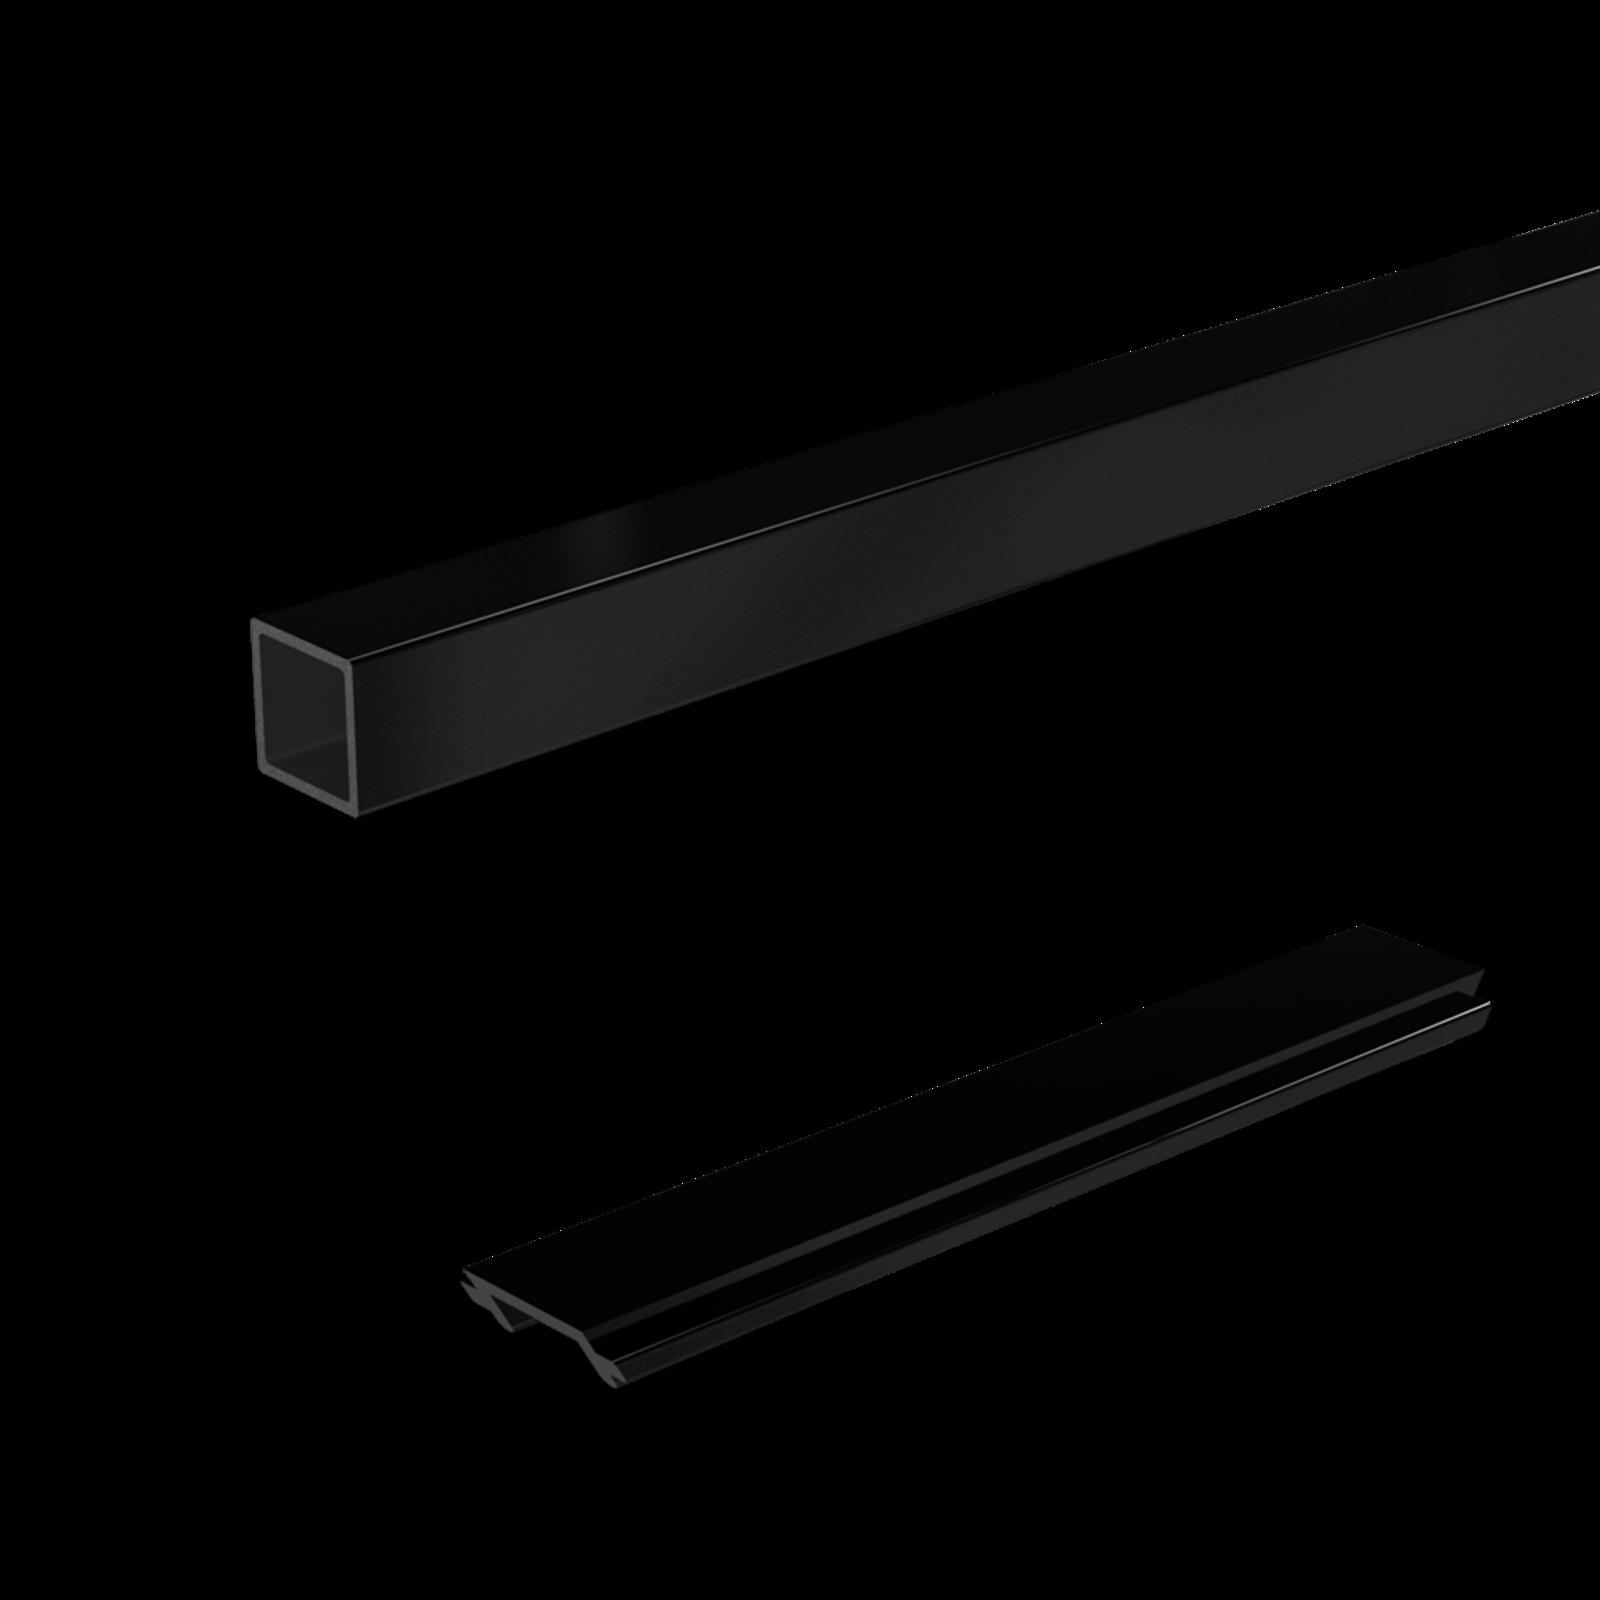 Peak 1800mm Black Aluminium Balustrade Standard Stair Baluster And Spacer Kit